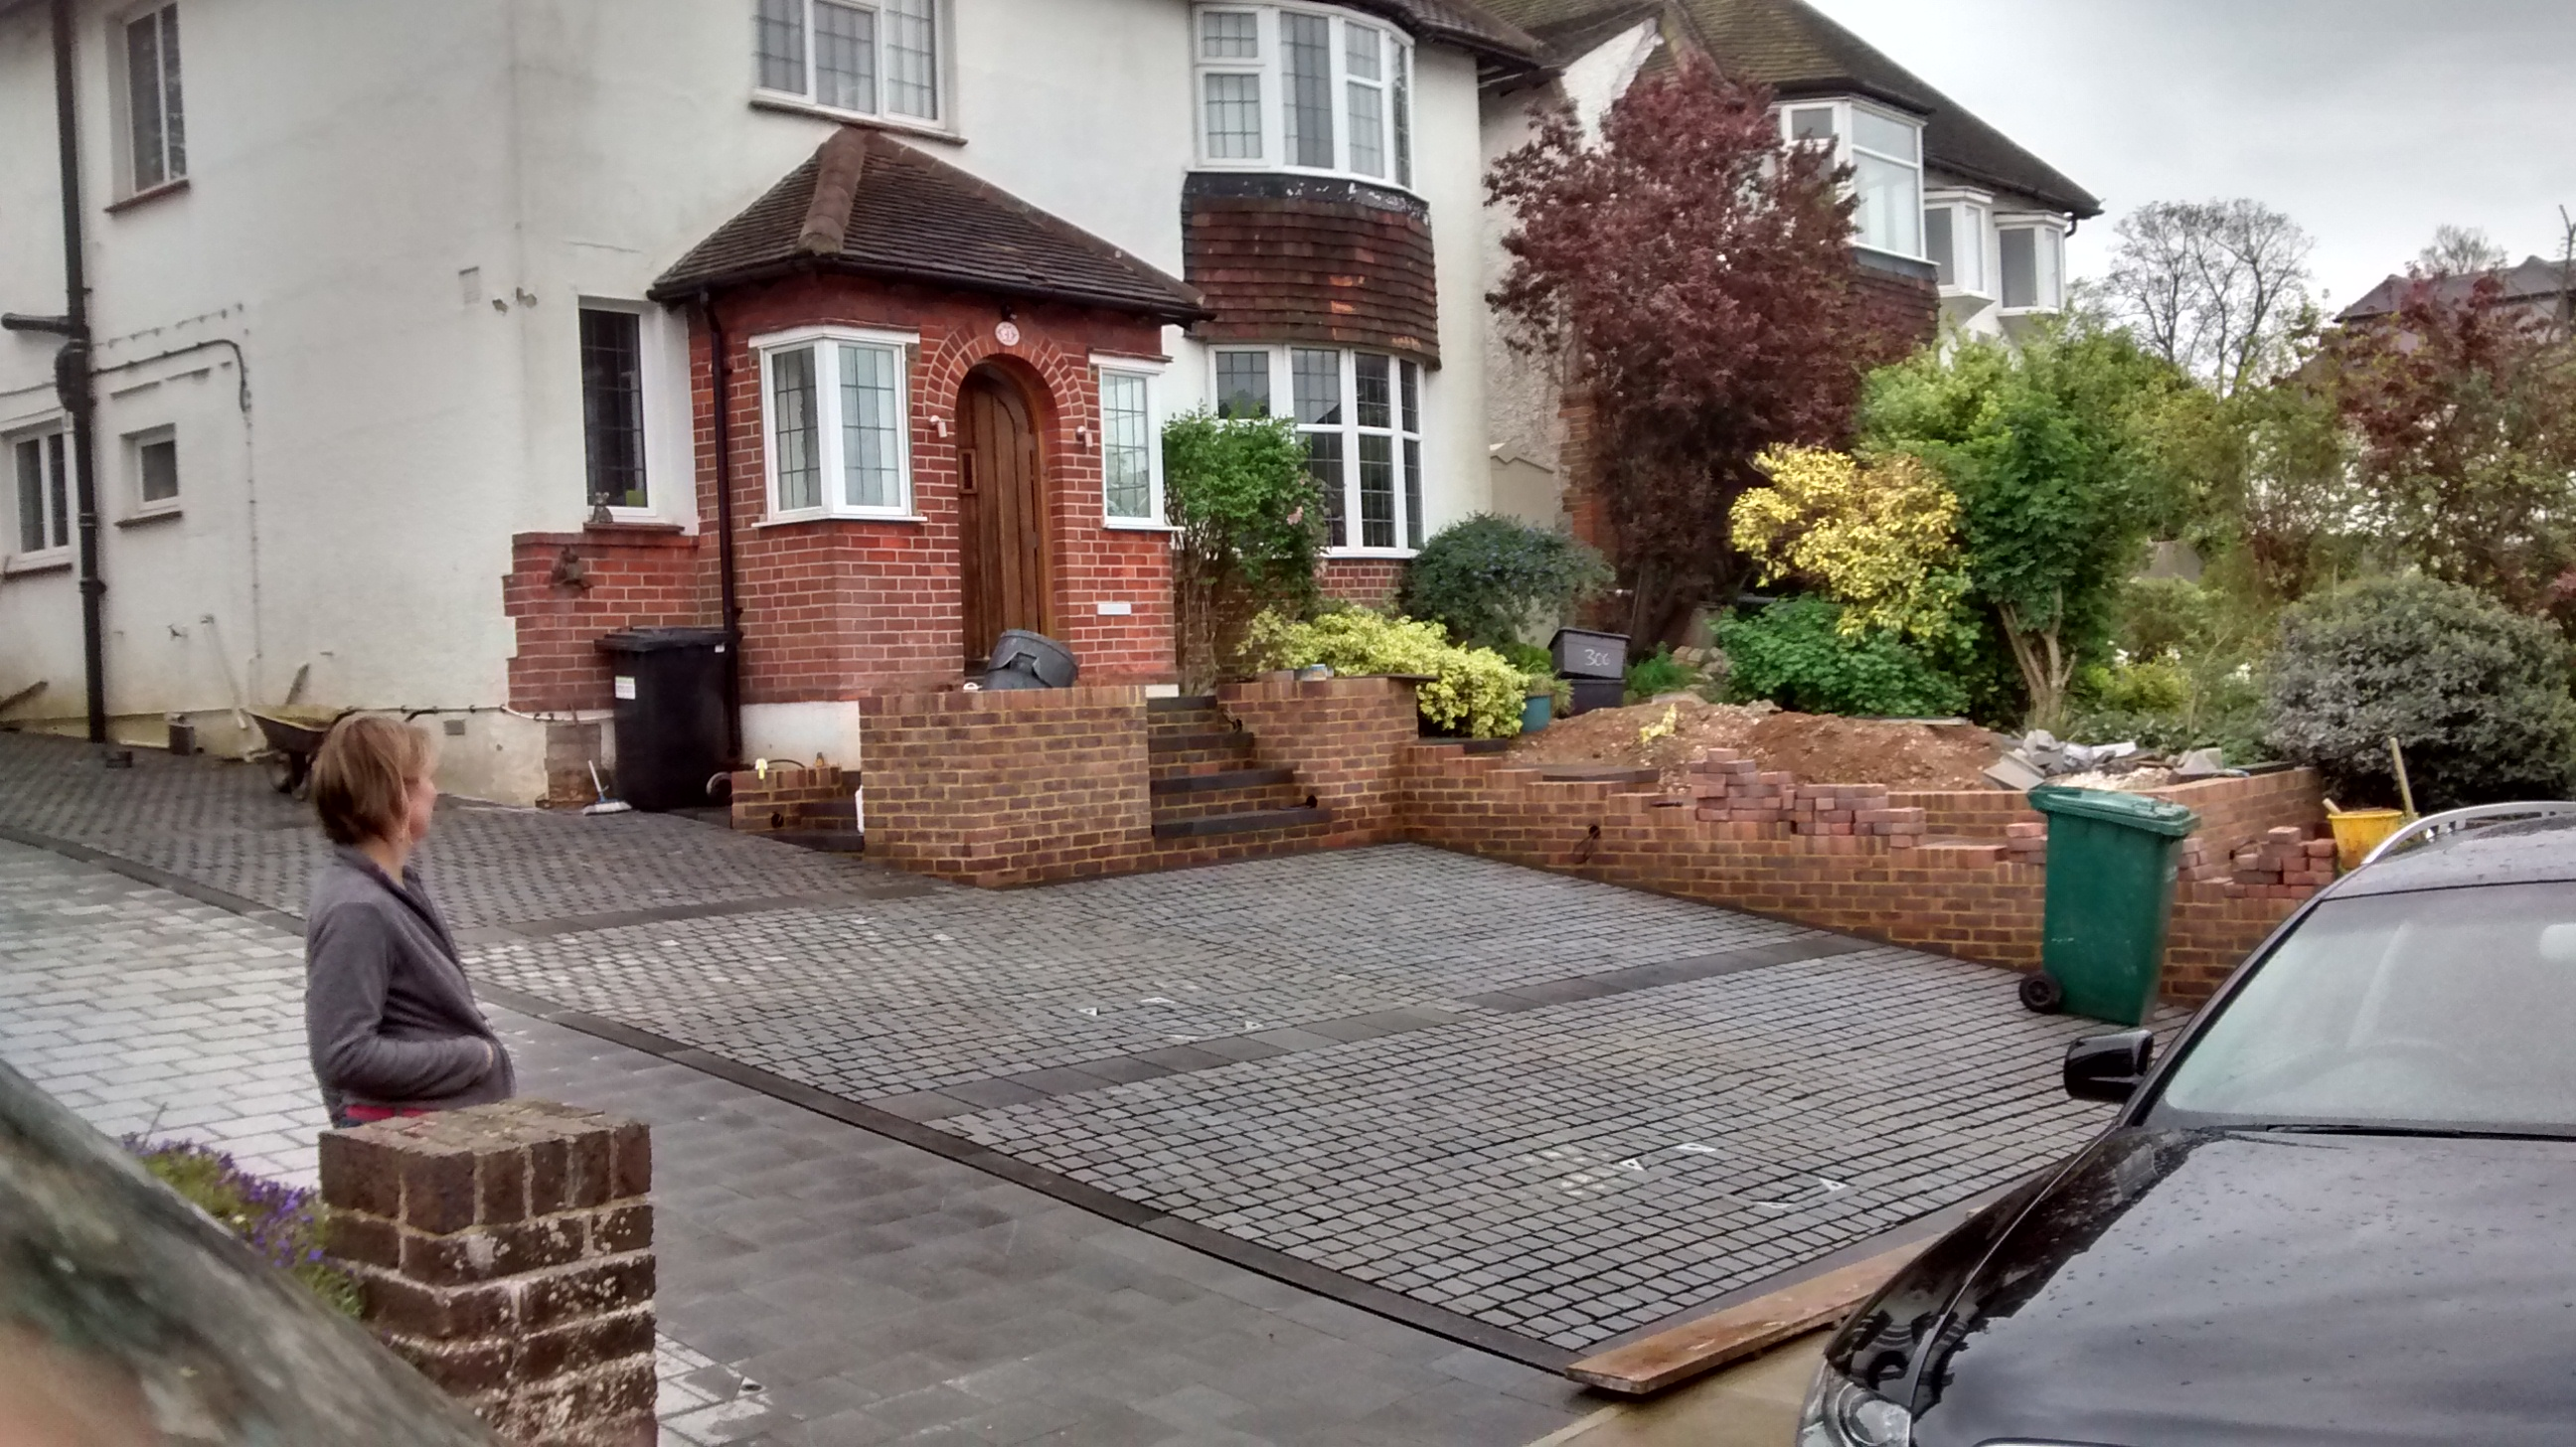 Granite sett drive